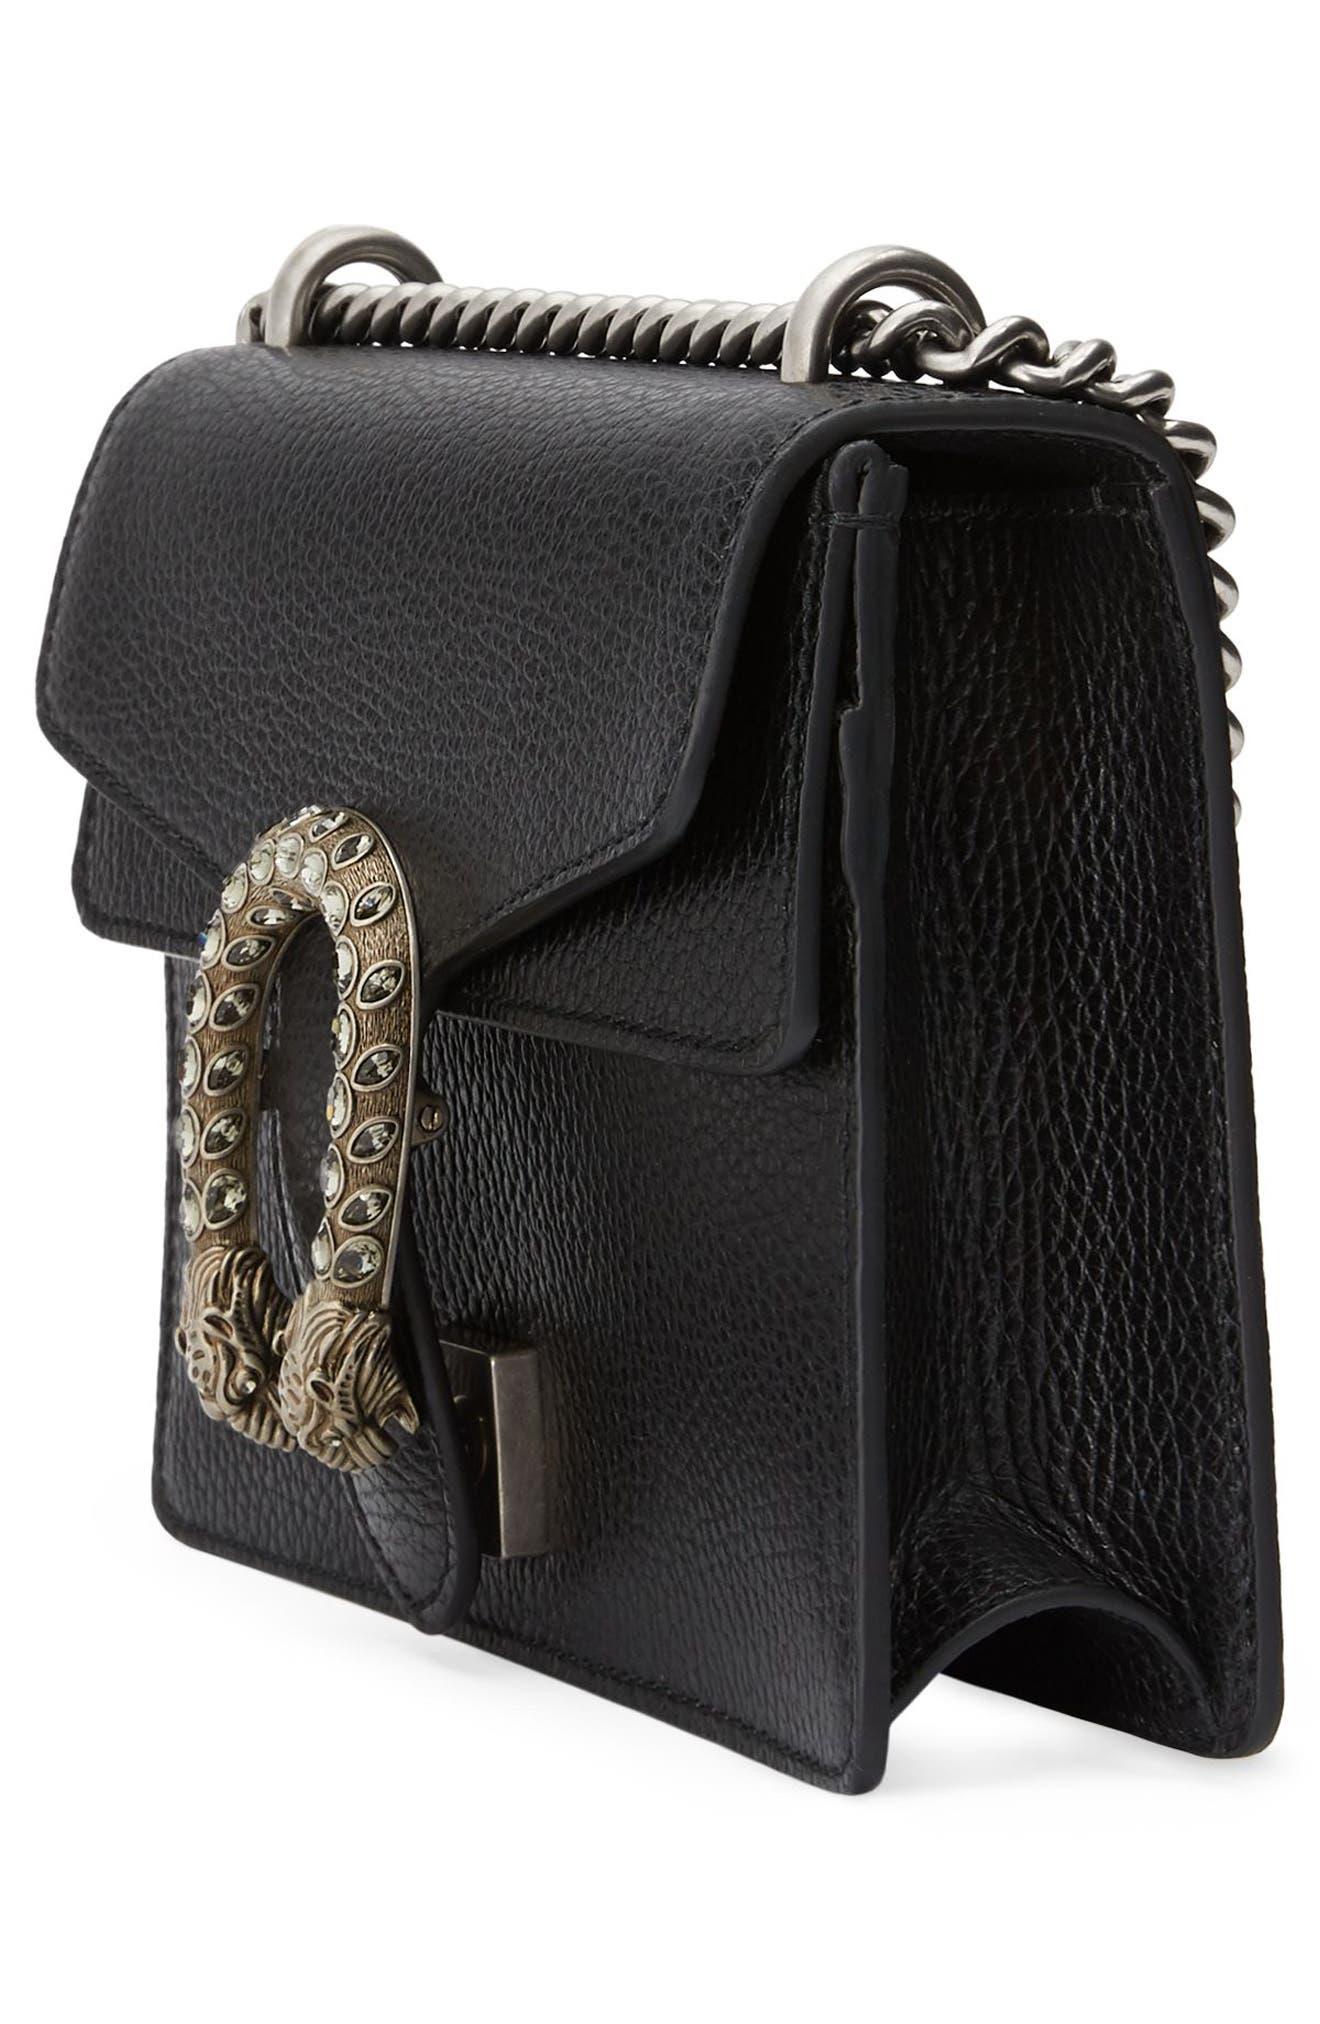 Mini Dionysus Leather Shoulder Bag,                             Alternate thumbnail 5, color,                             NERO/ BLACK DIAMOND